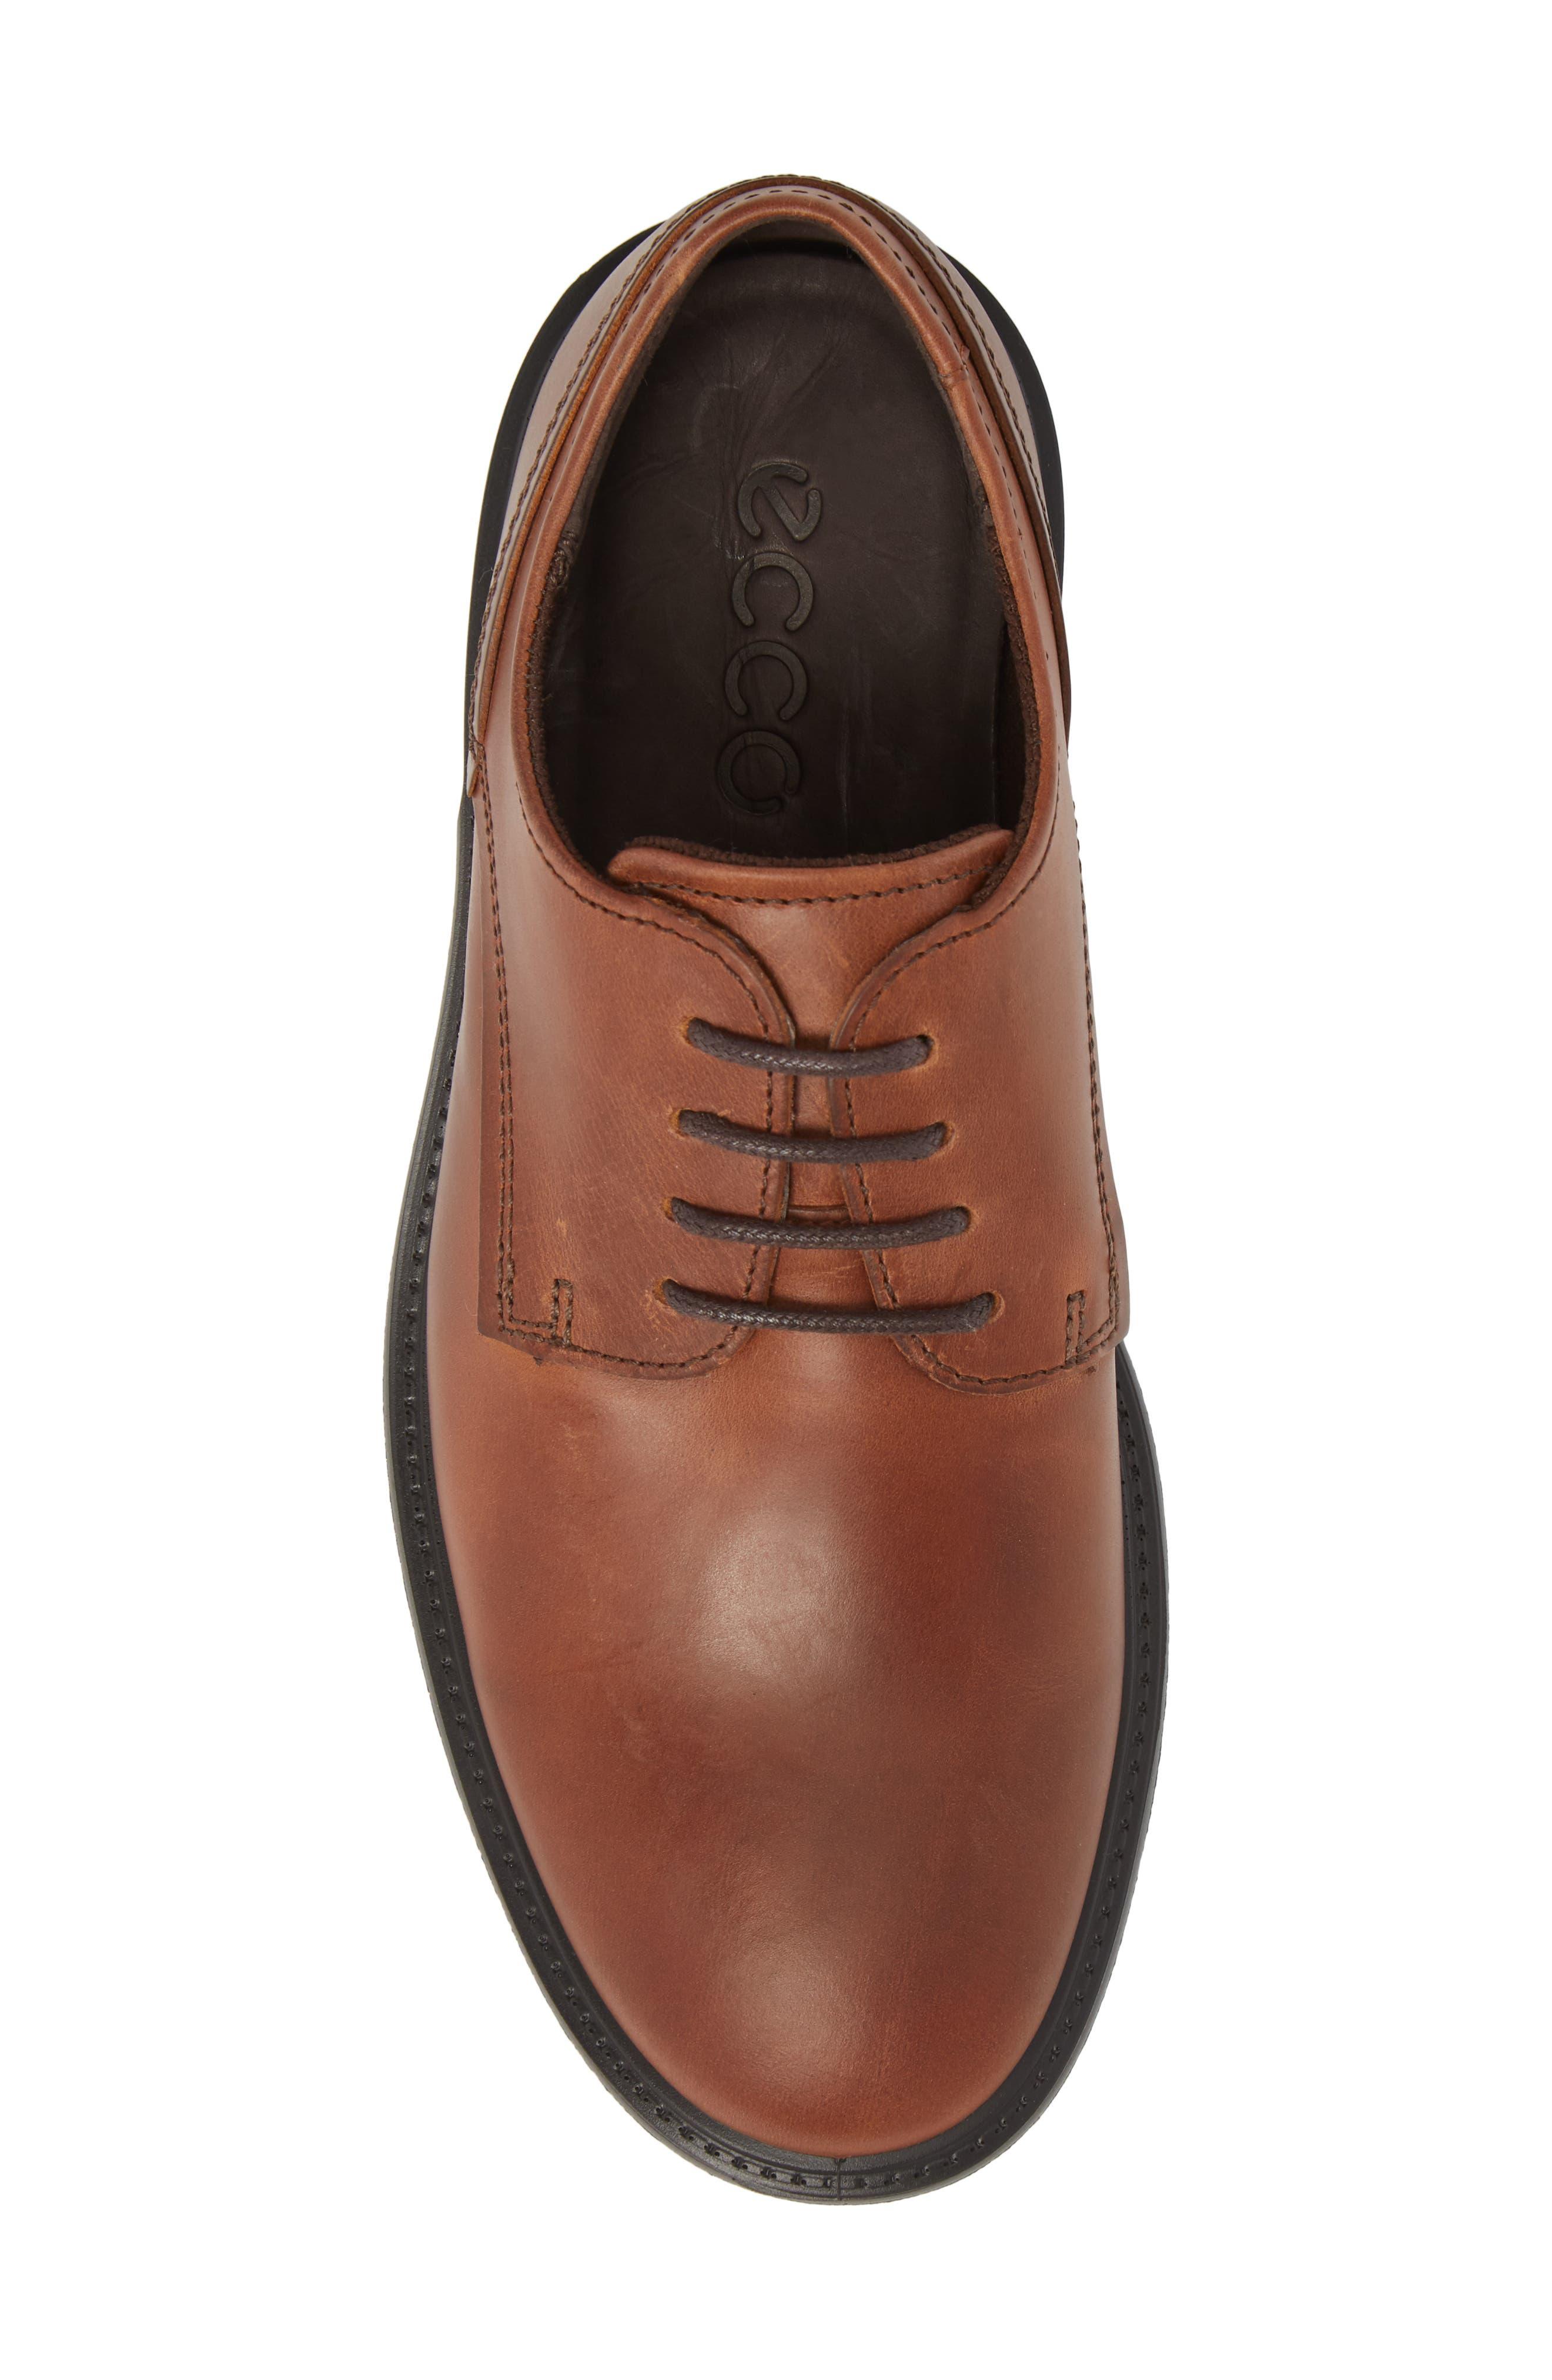 Knoxville Moonless AZT Derby,                             Alternate thumbnail 5, color,                             Cognac Leather